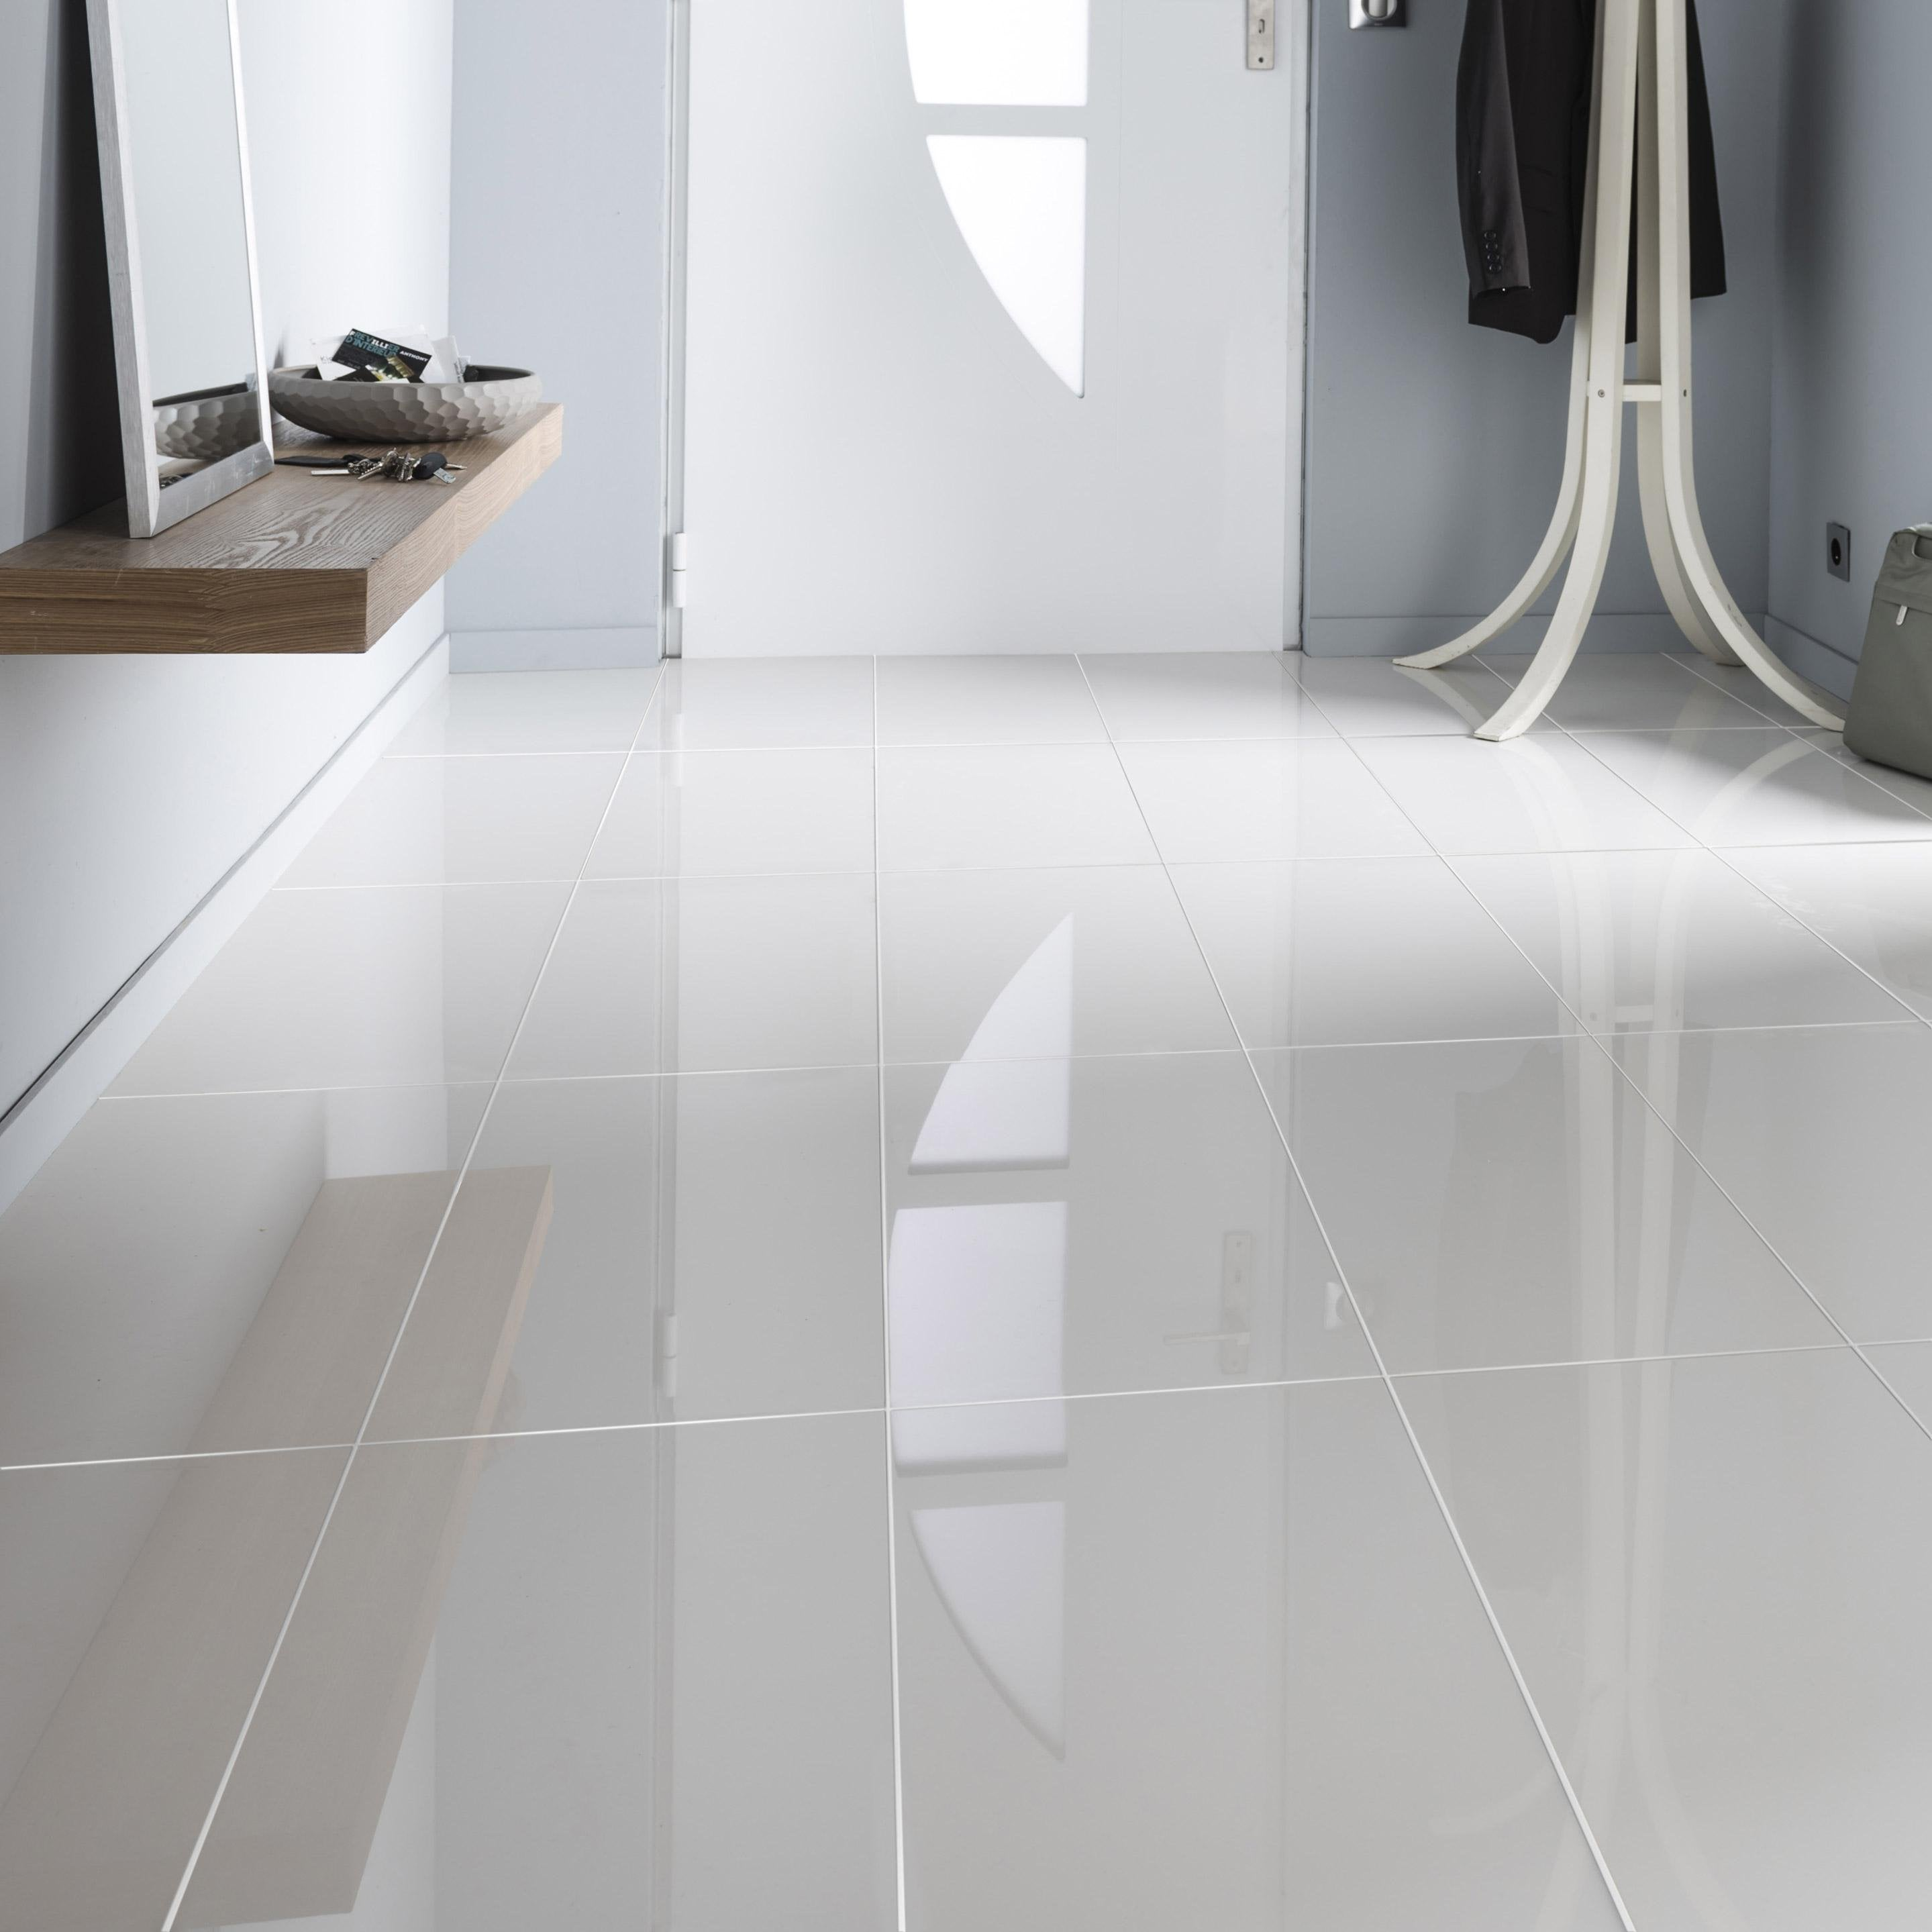 Charmant Carrelage Sol Et Mur Intenso Brillant Blanc L.30 X L.60 Cm ARTENS